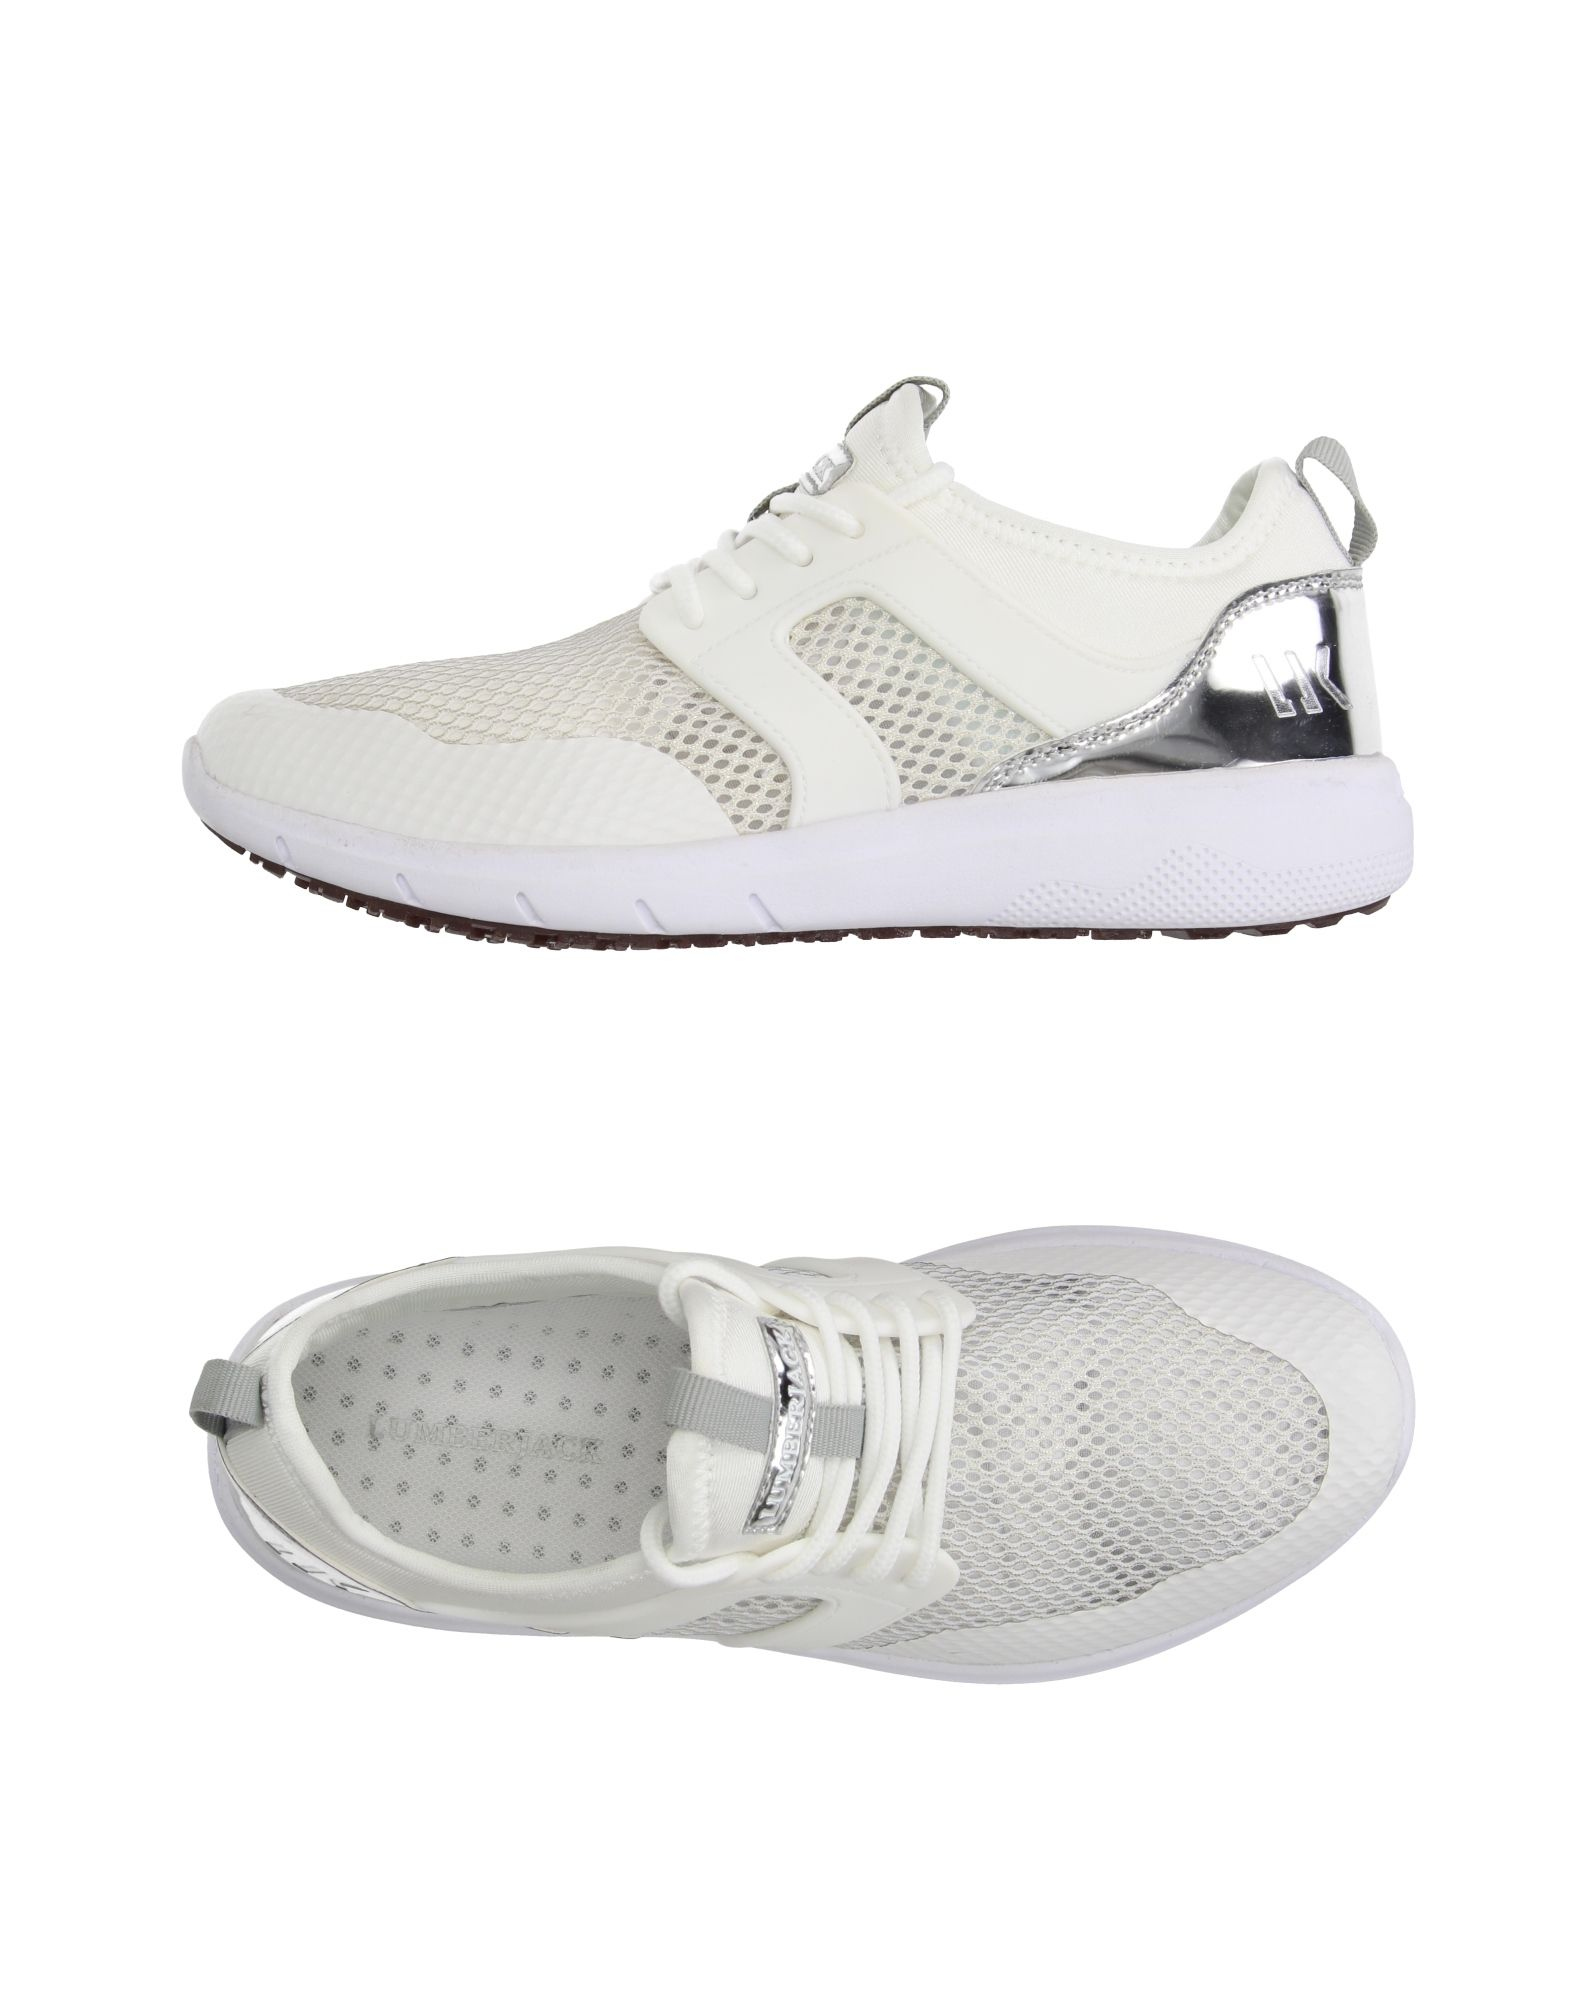 85dae9e28dd LUMBERJACK ΠΑΠΟΥΤΣΙΑ Παπούτσια τένις χαμηλά, Γυναικεία παπούτσια ...